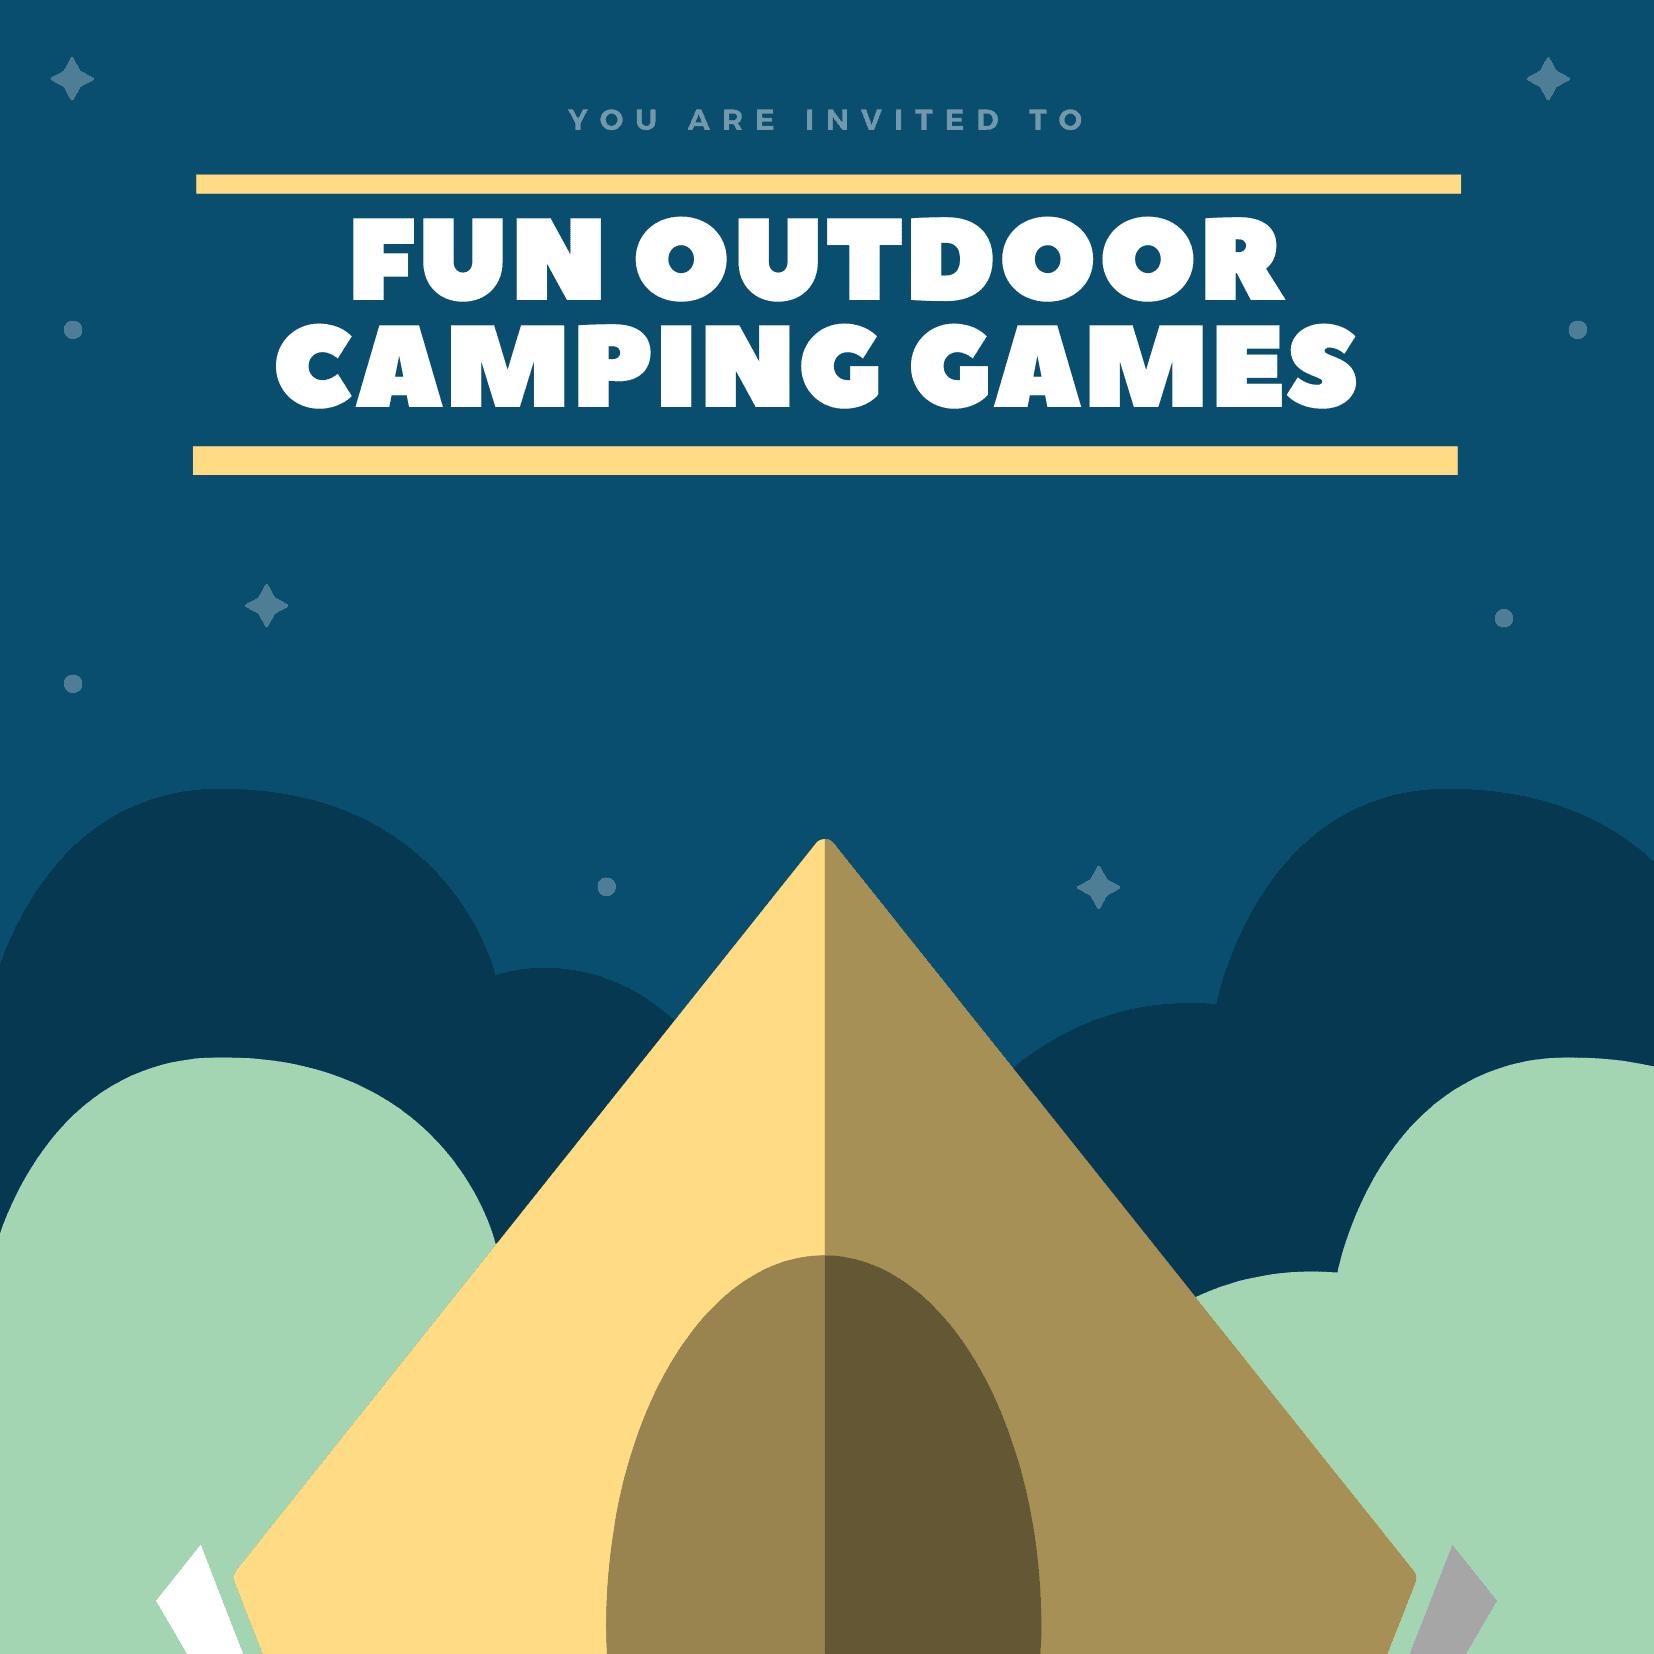 un Outdoor Camping Games